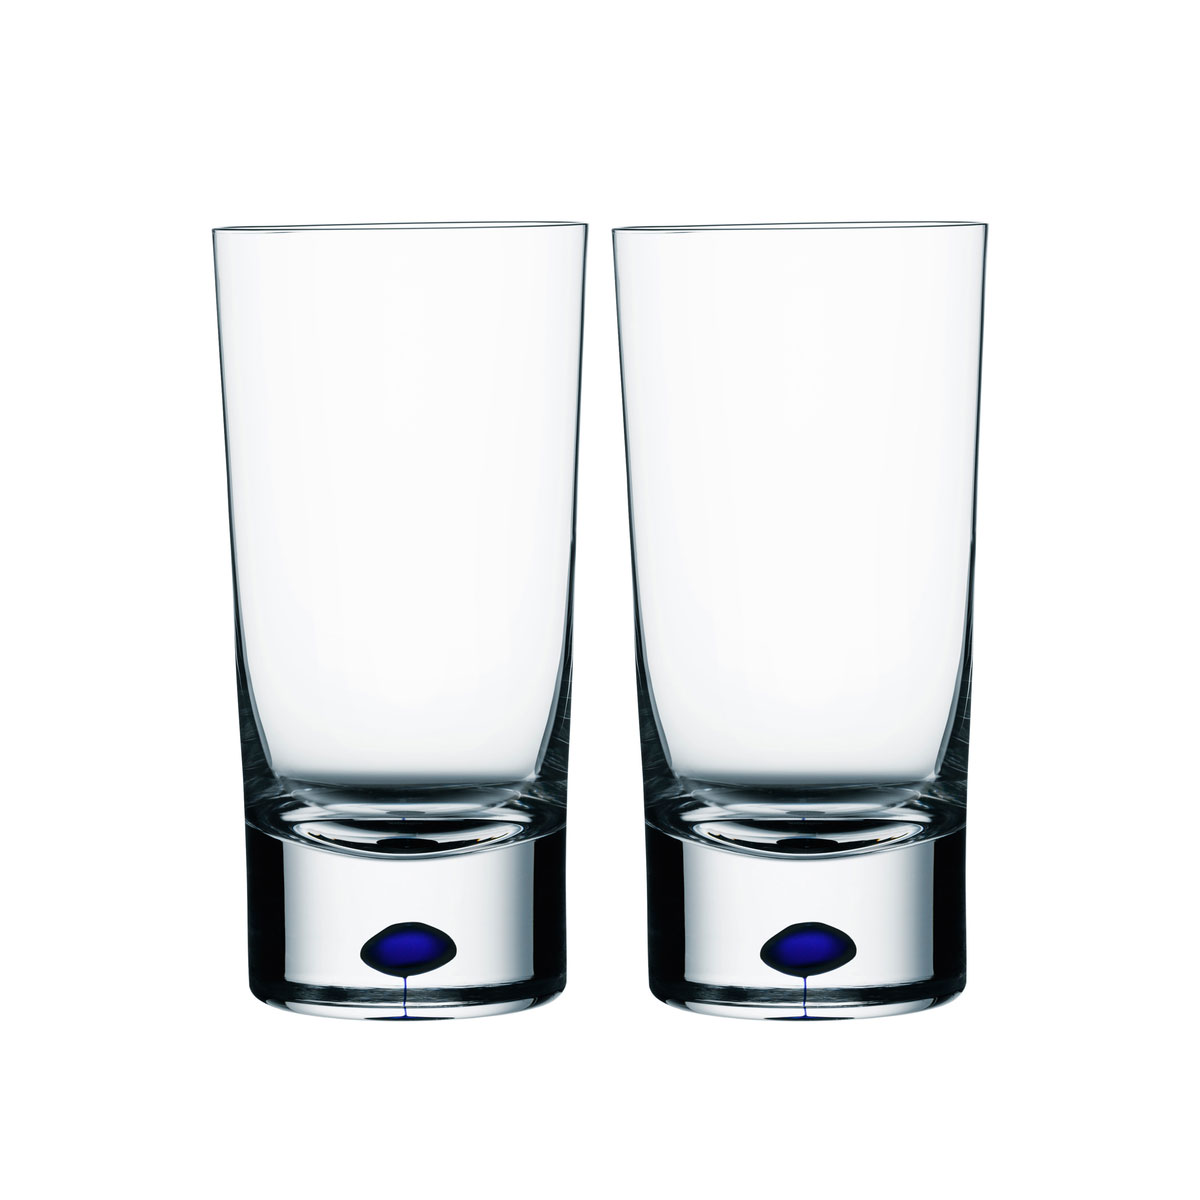 Orrefors Crystal, Intermezzo Blue Tumbler, Pair